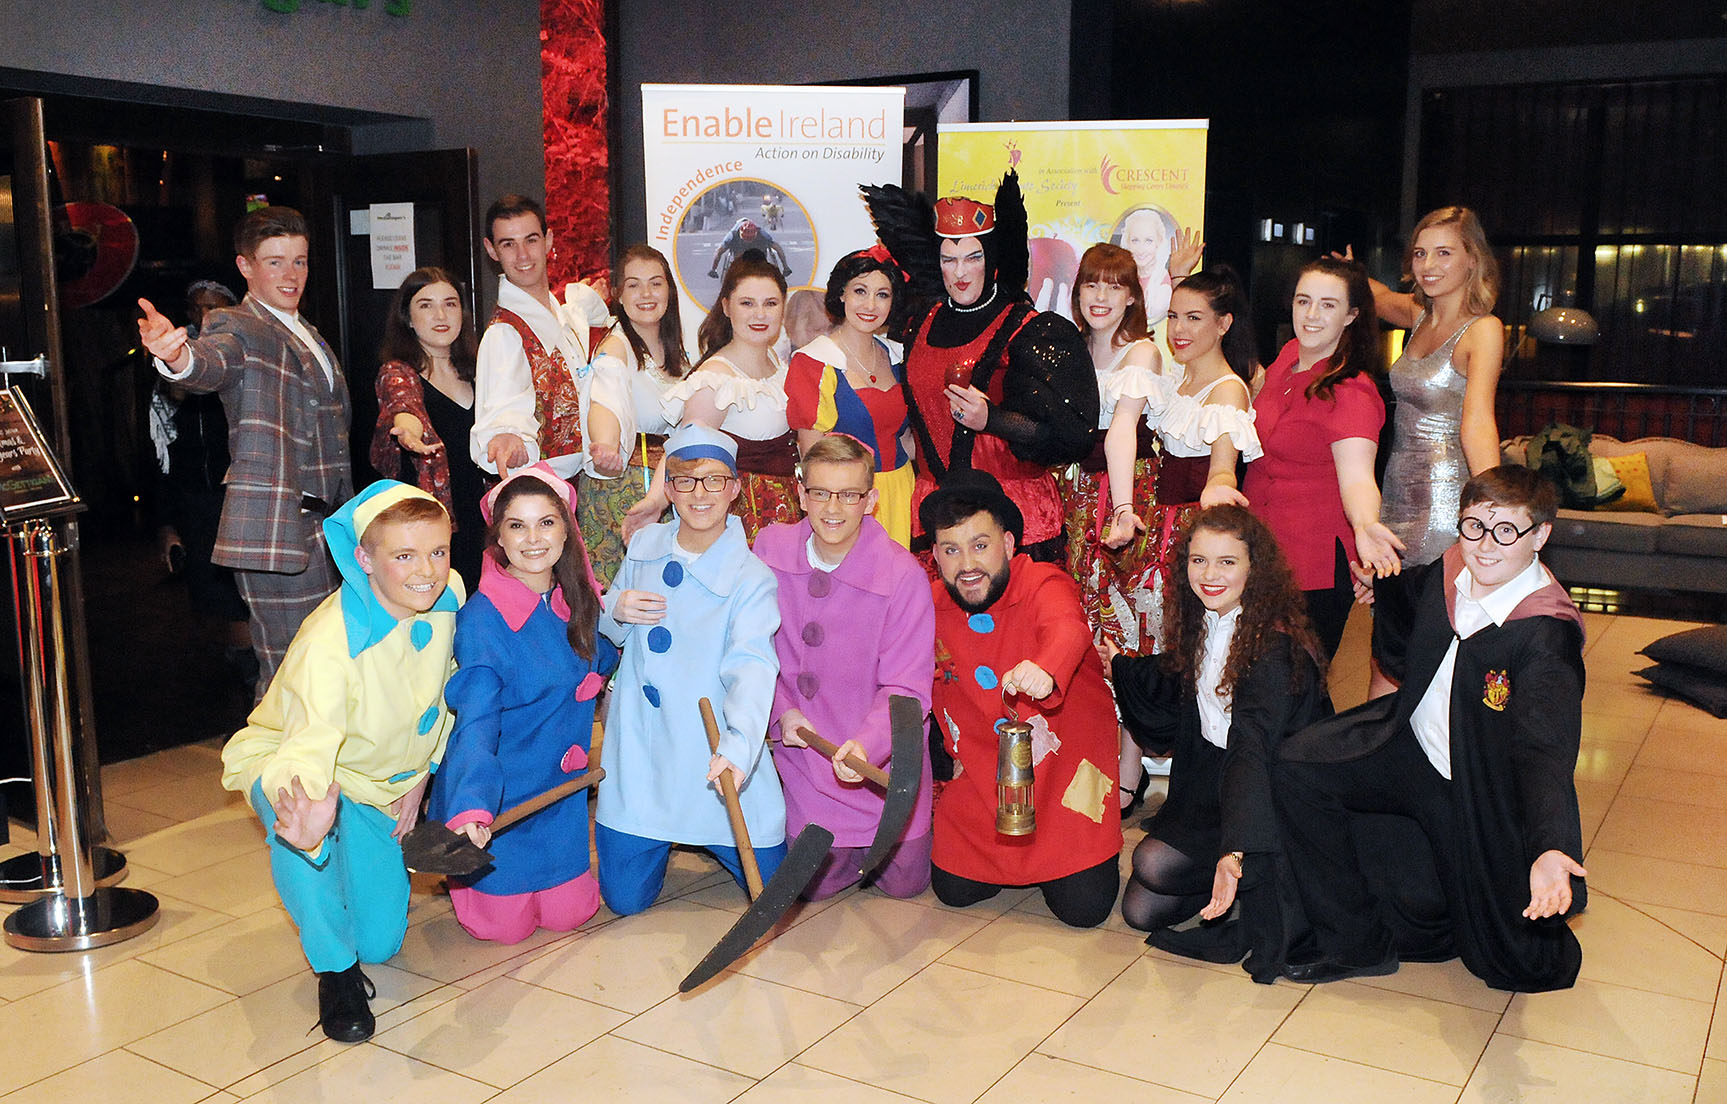 Limerick Panto Society Presents Snow White